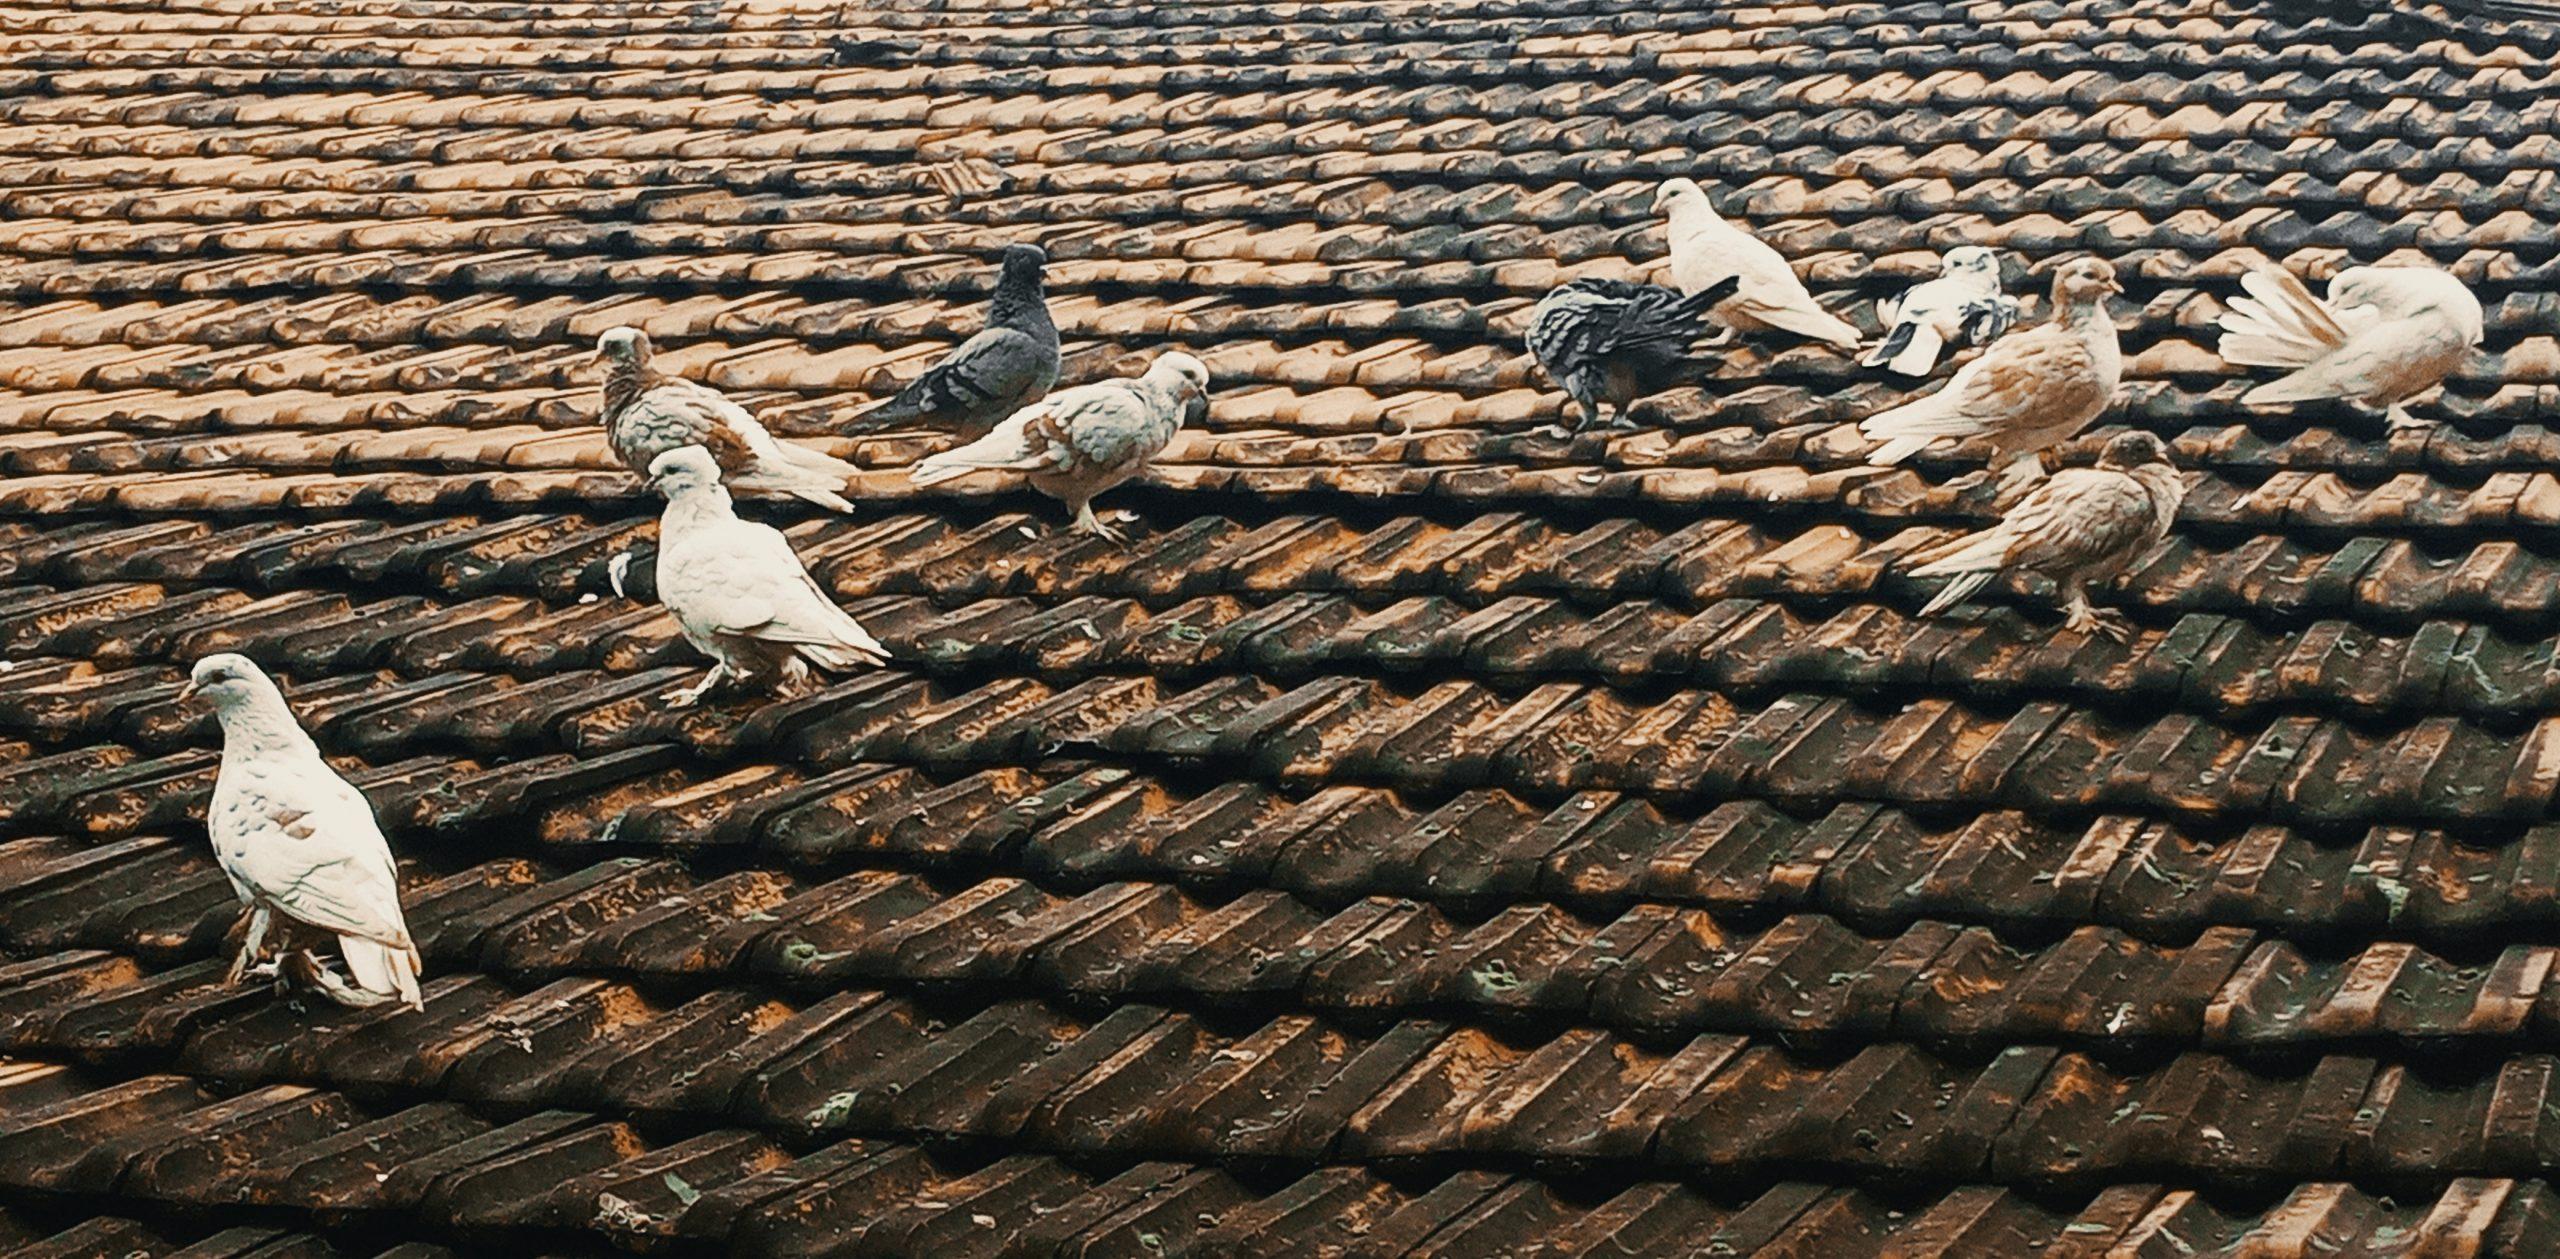 Pigeons on roof